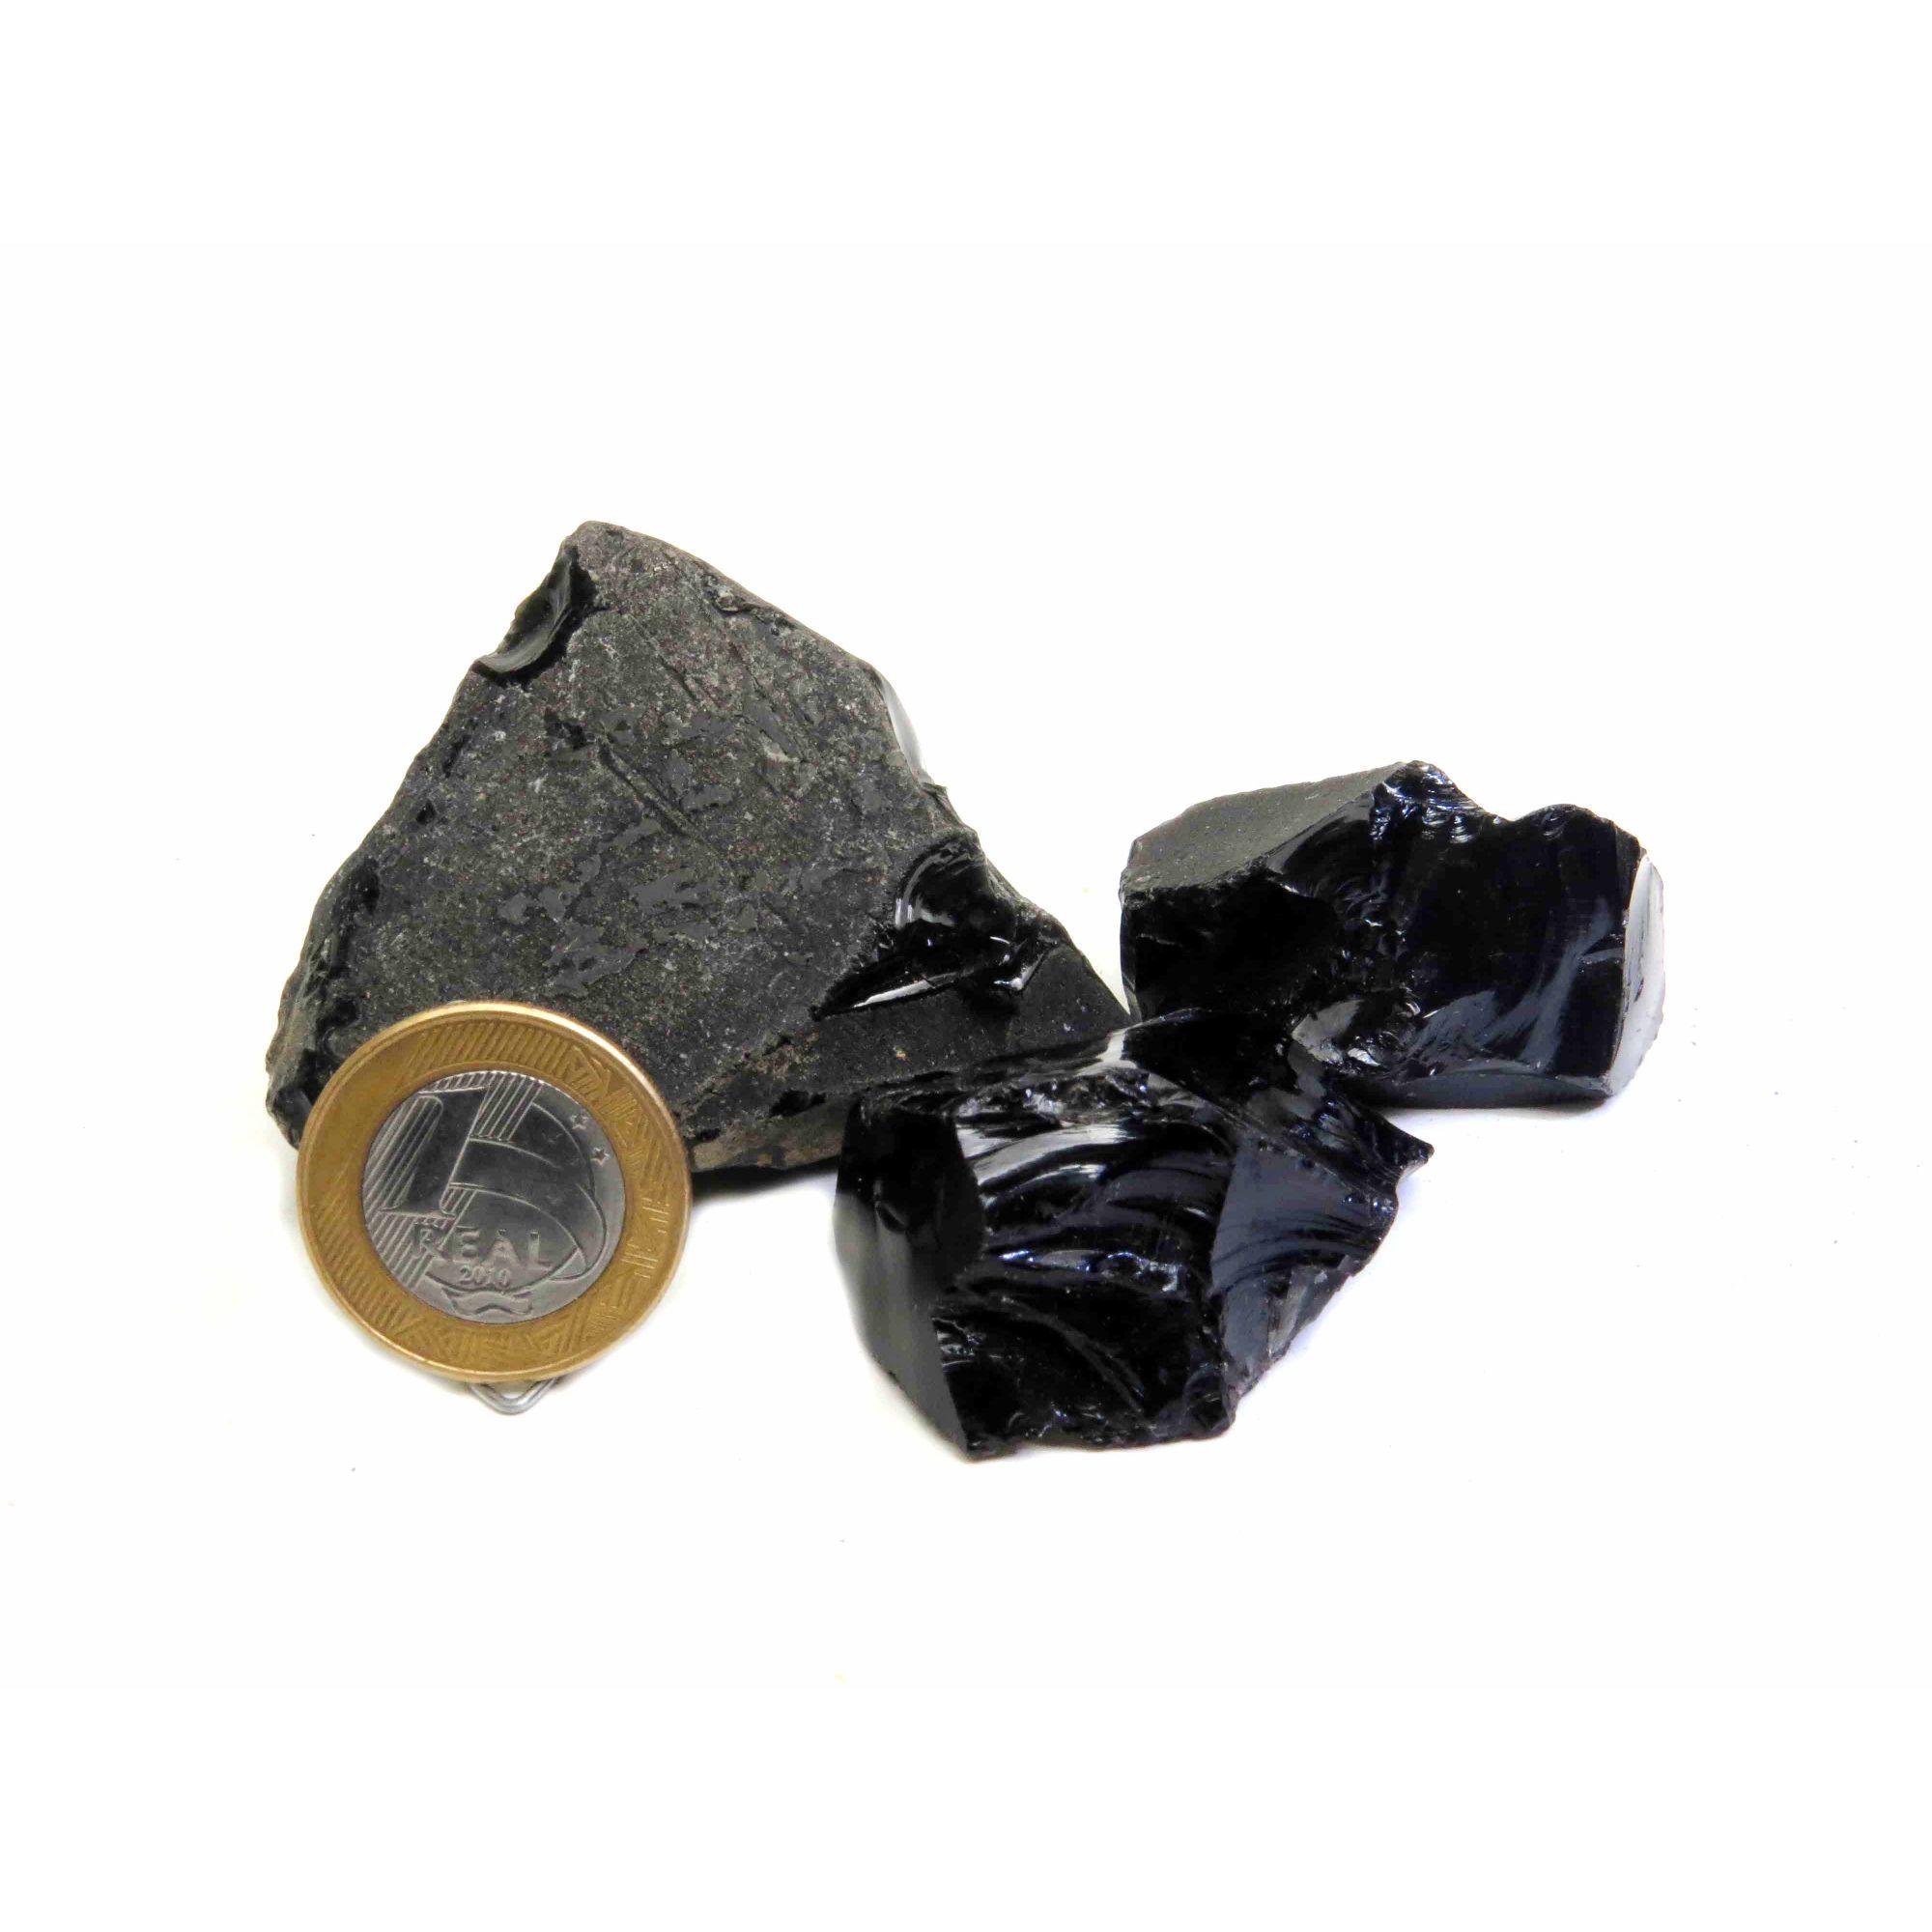 Obsidiana - 4 a 5 cm